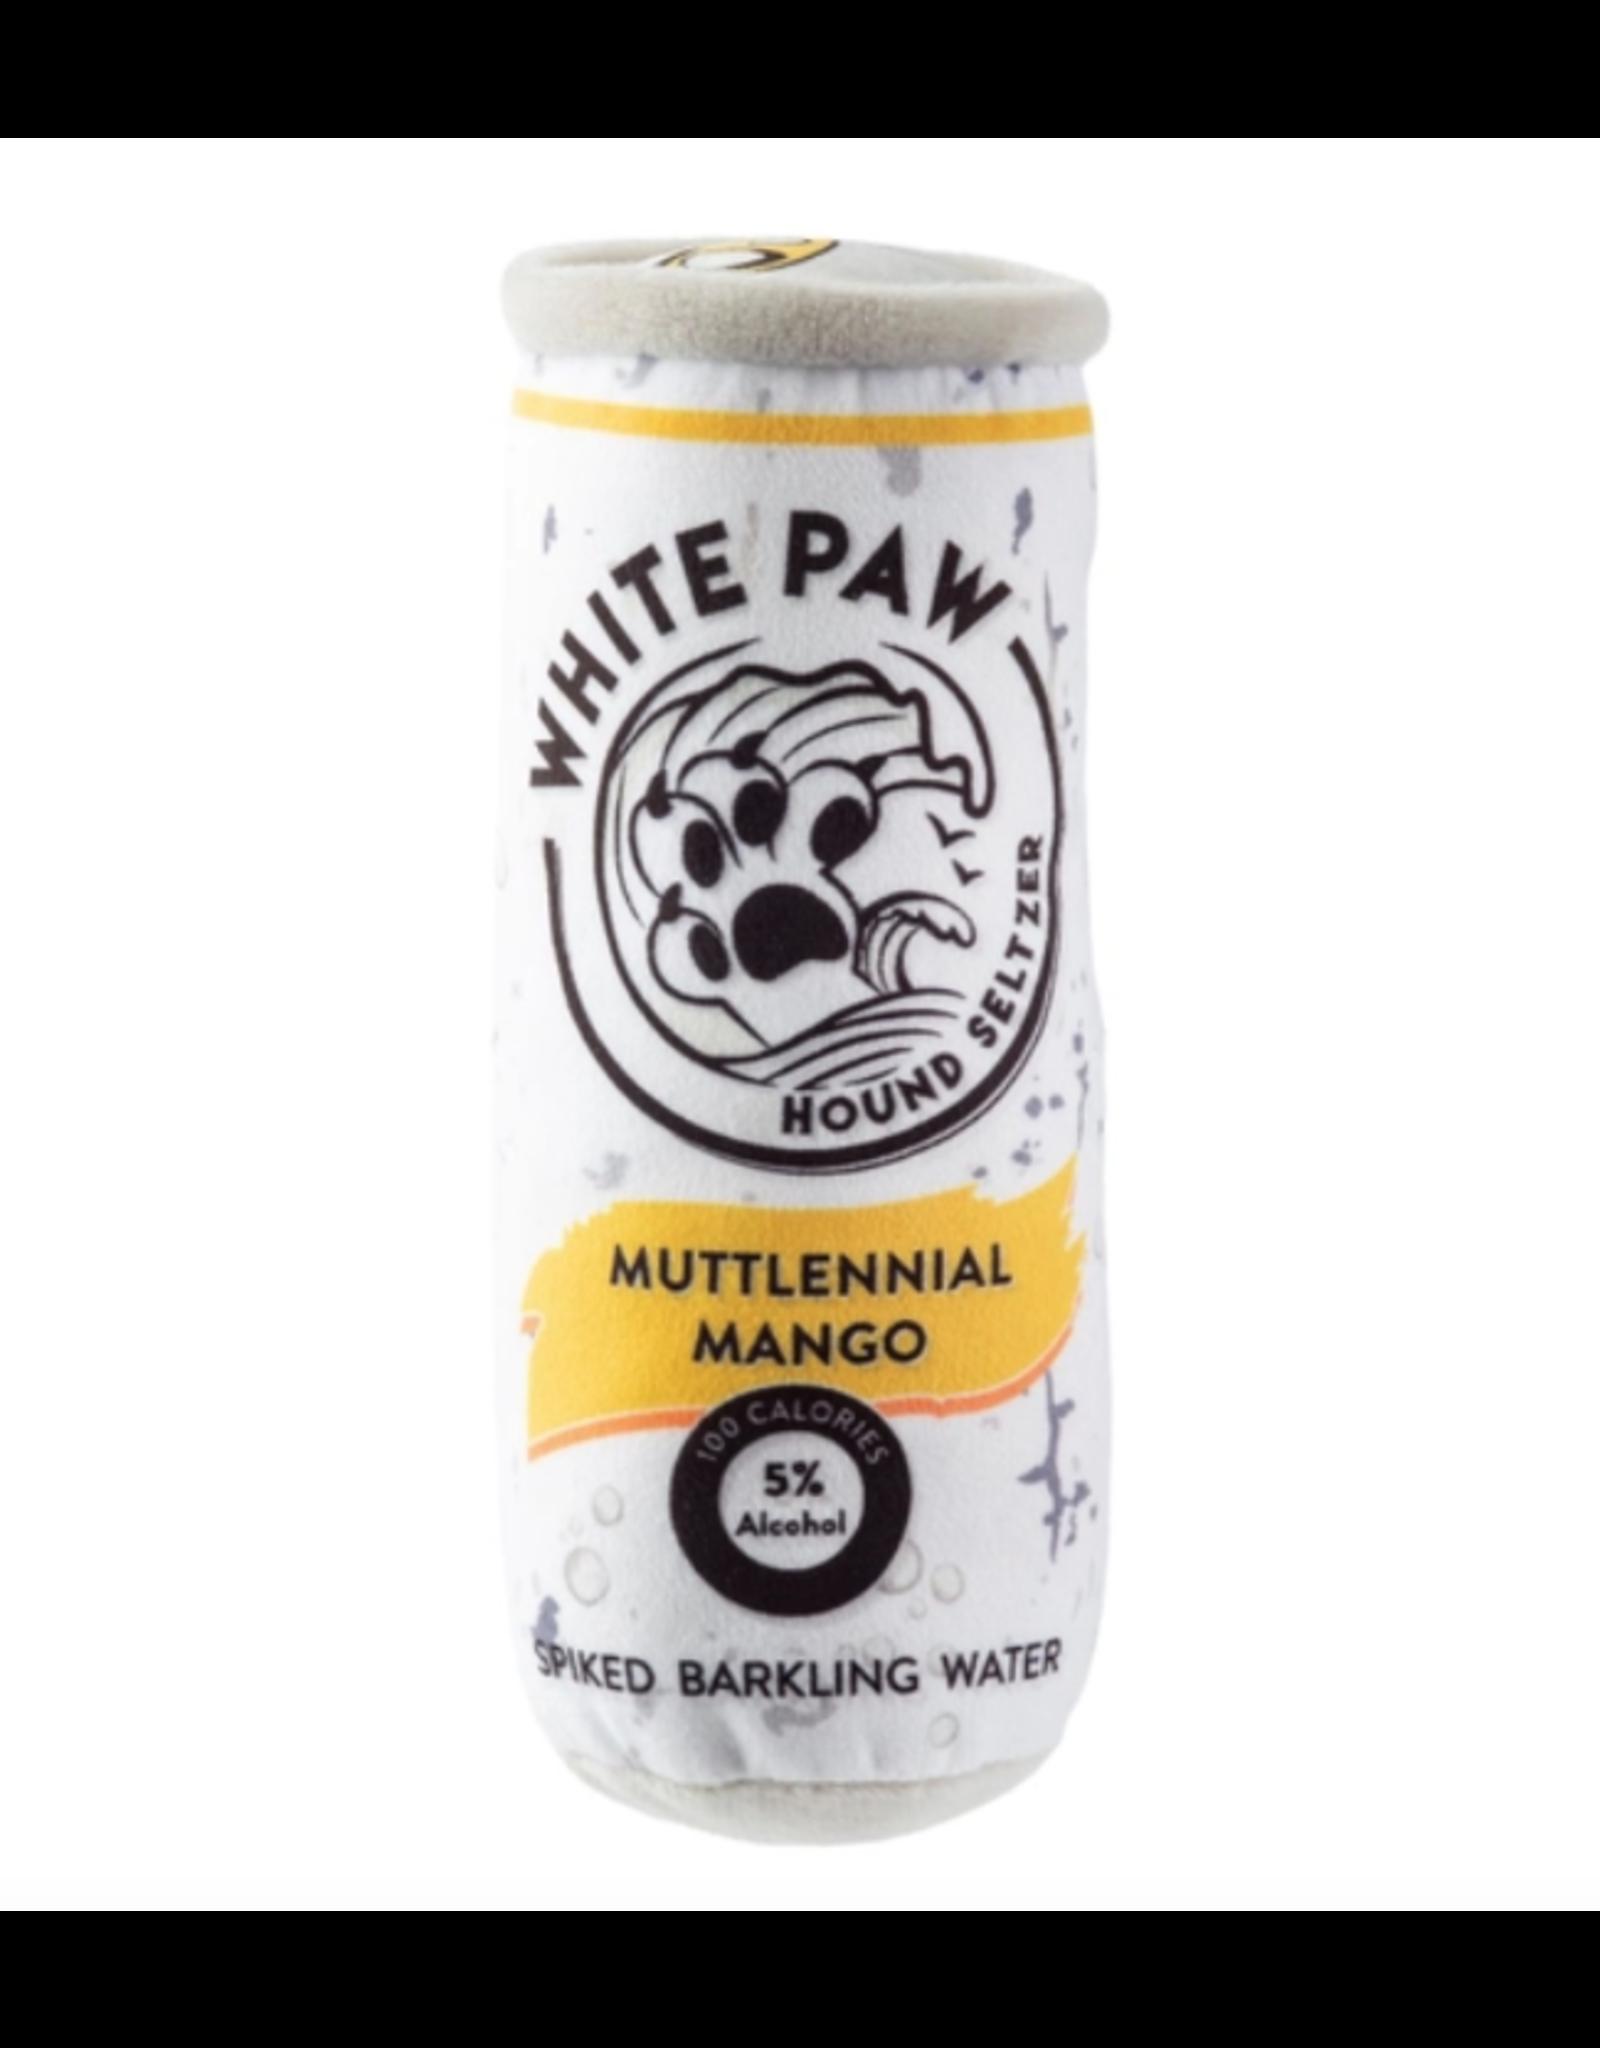 Haute Diggity Dog White Paw - Muttlennial Mango